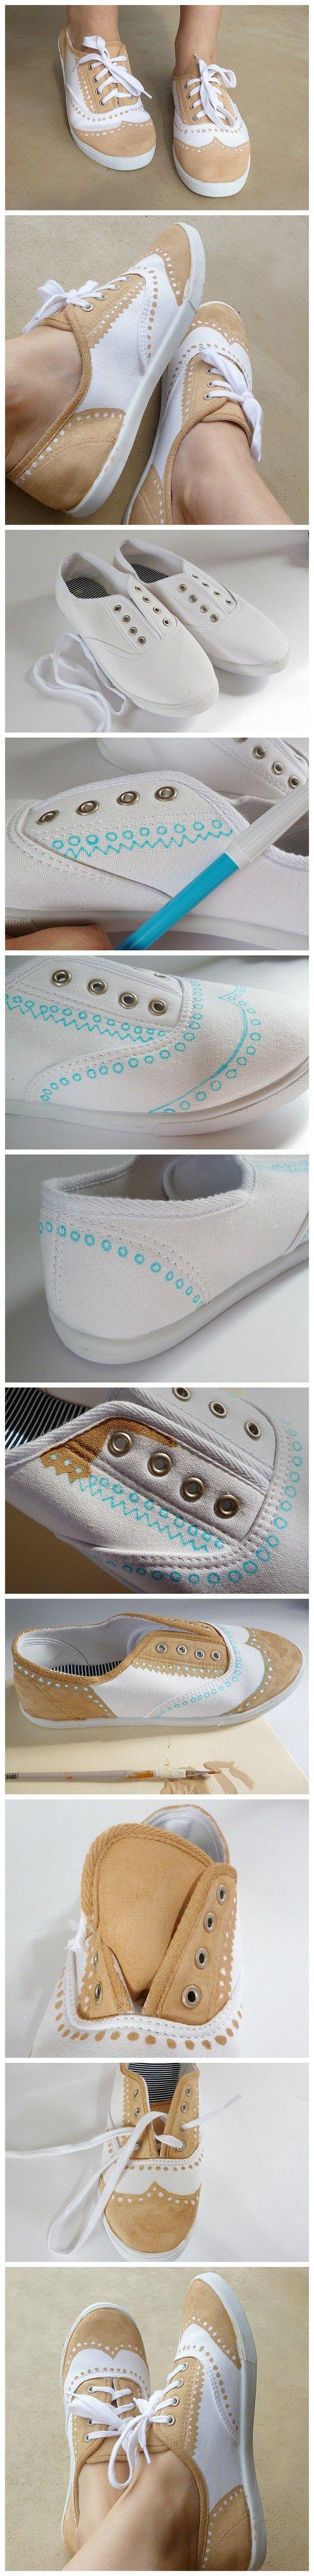 zapatillas tuneadas muy ingenioso 1